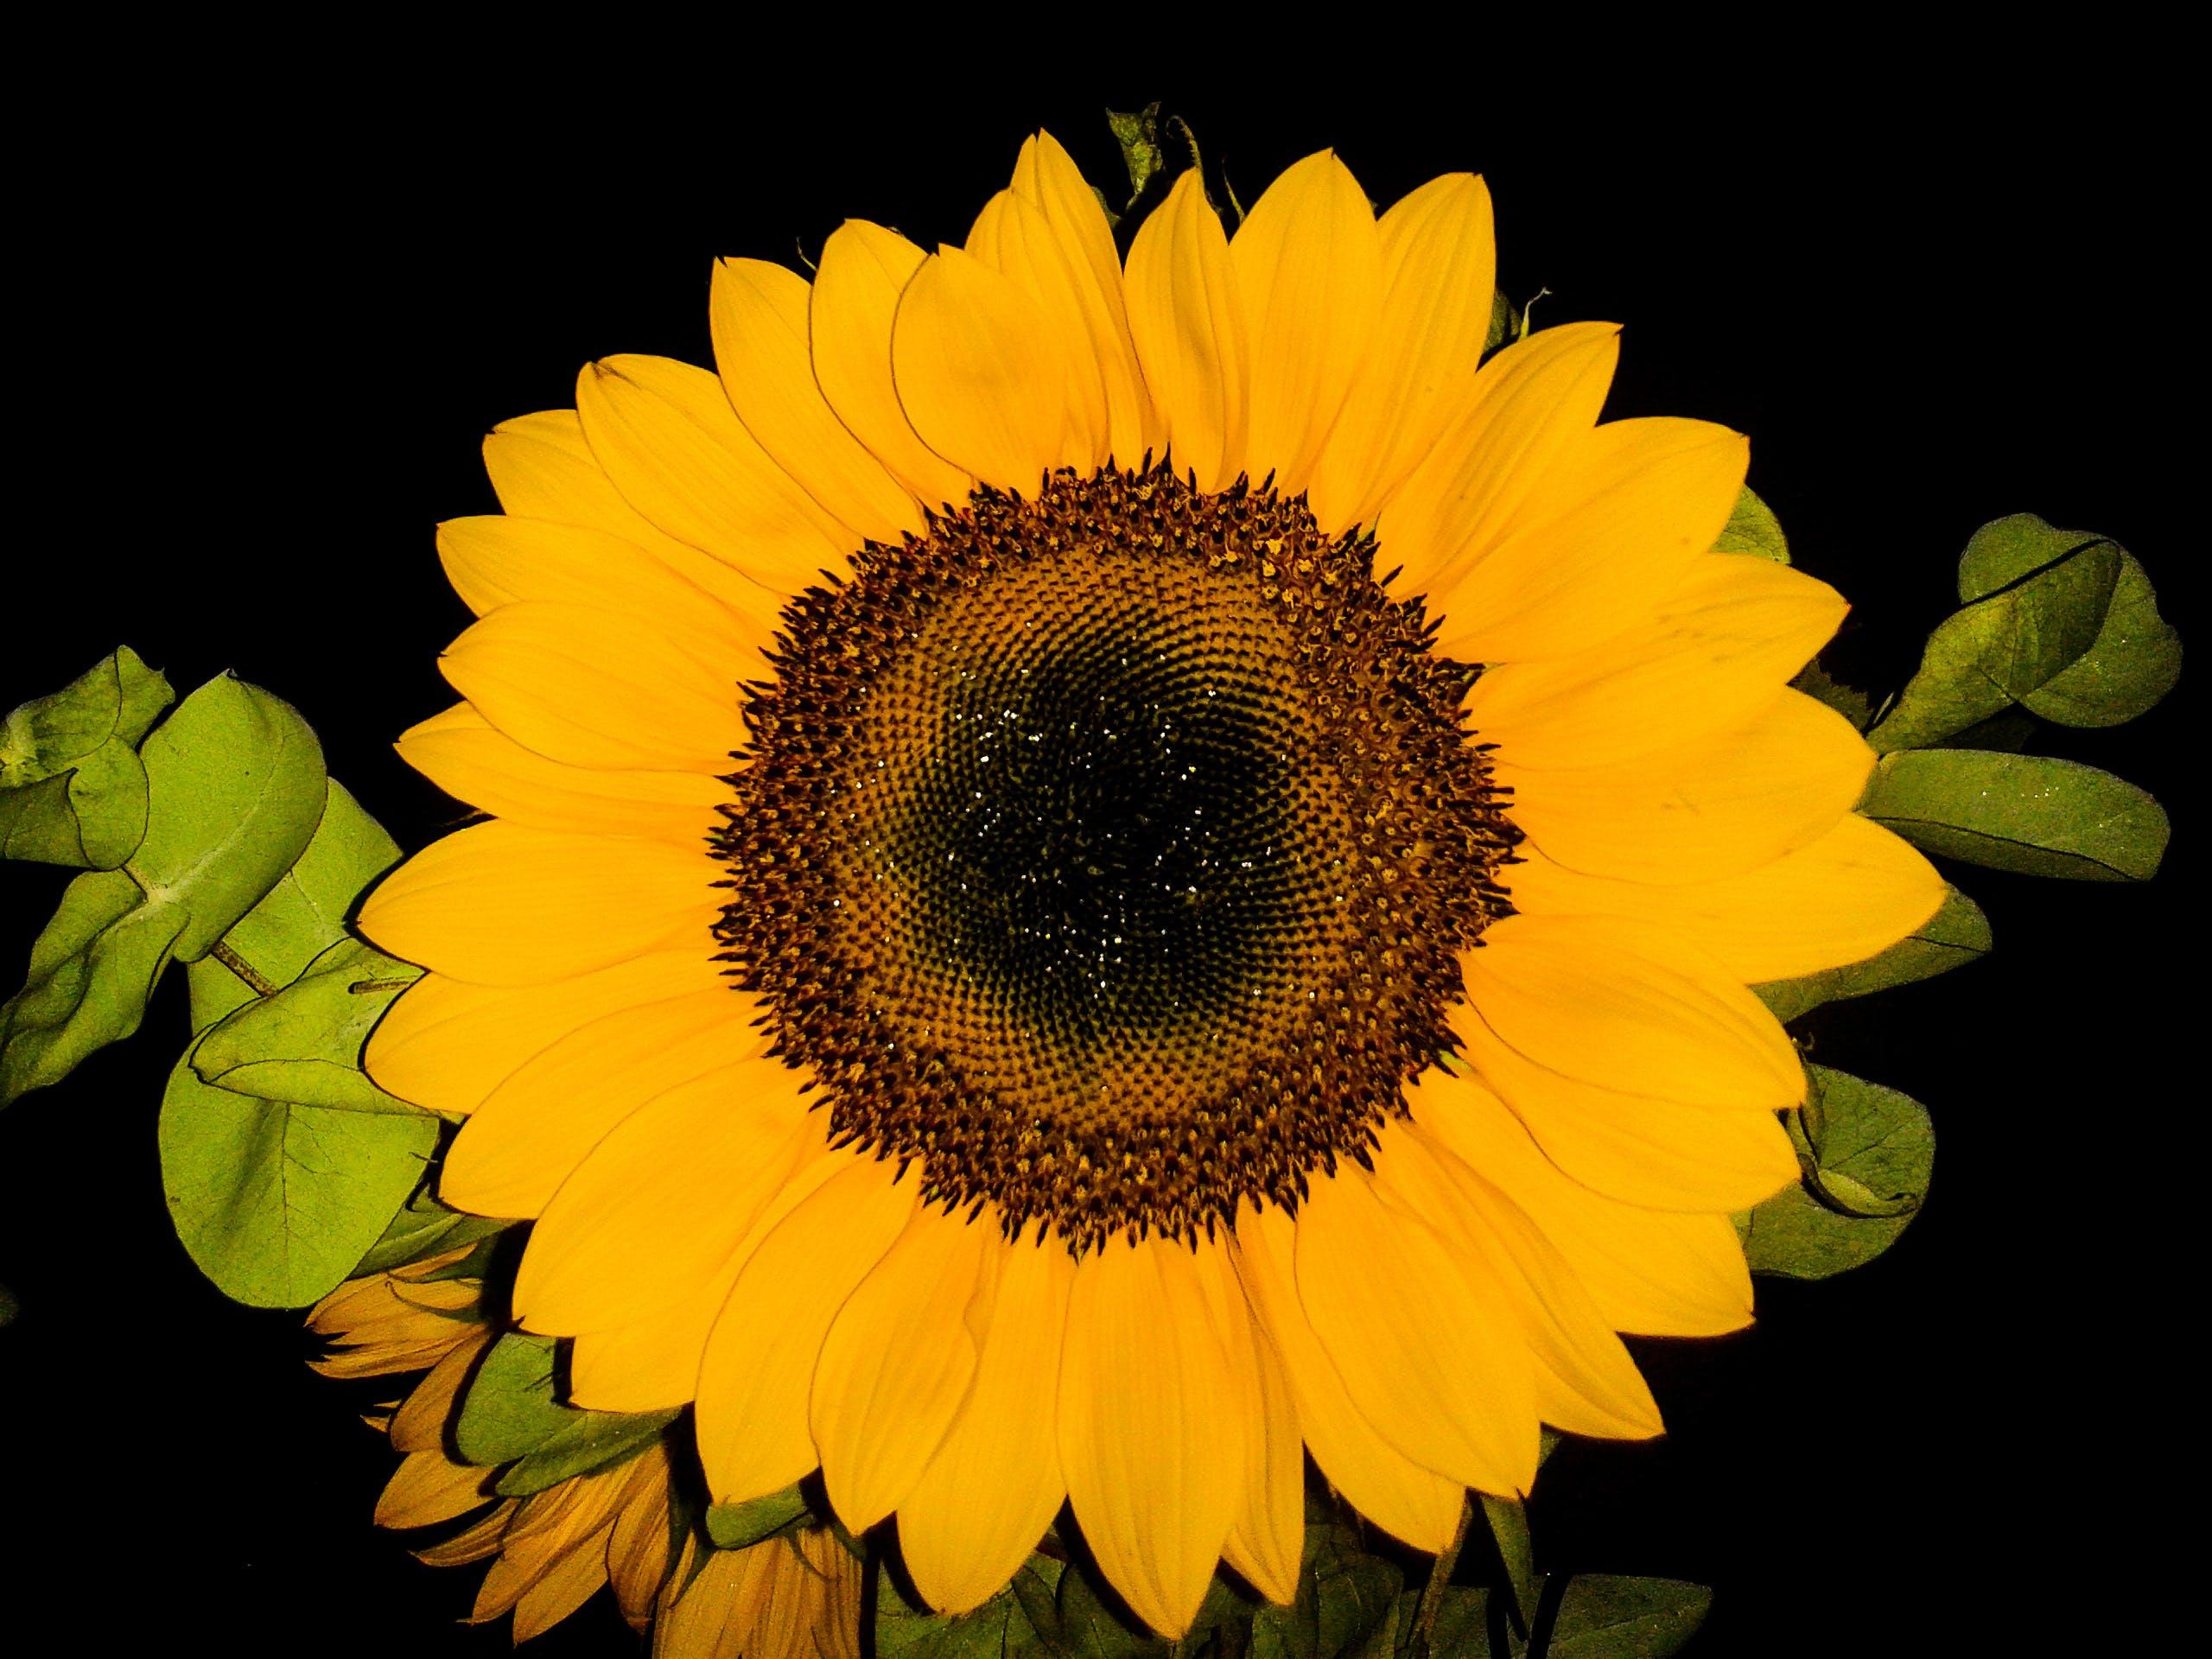 Free stock photo of beautiful flowers, flower, sunflower, yellow flower